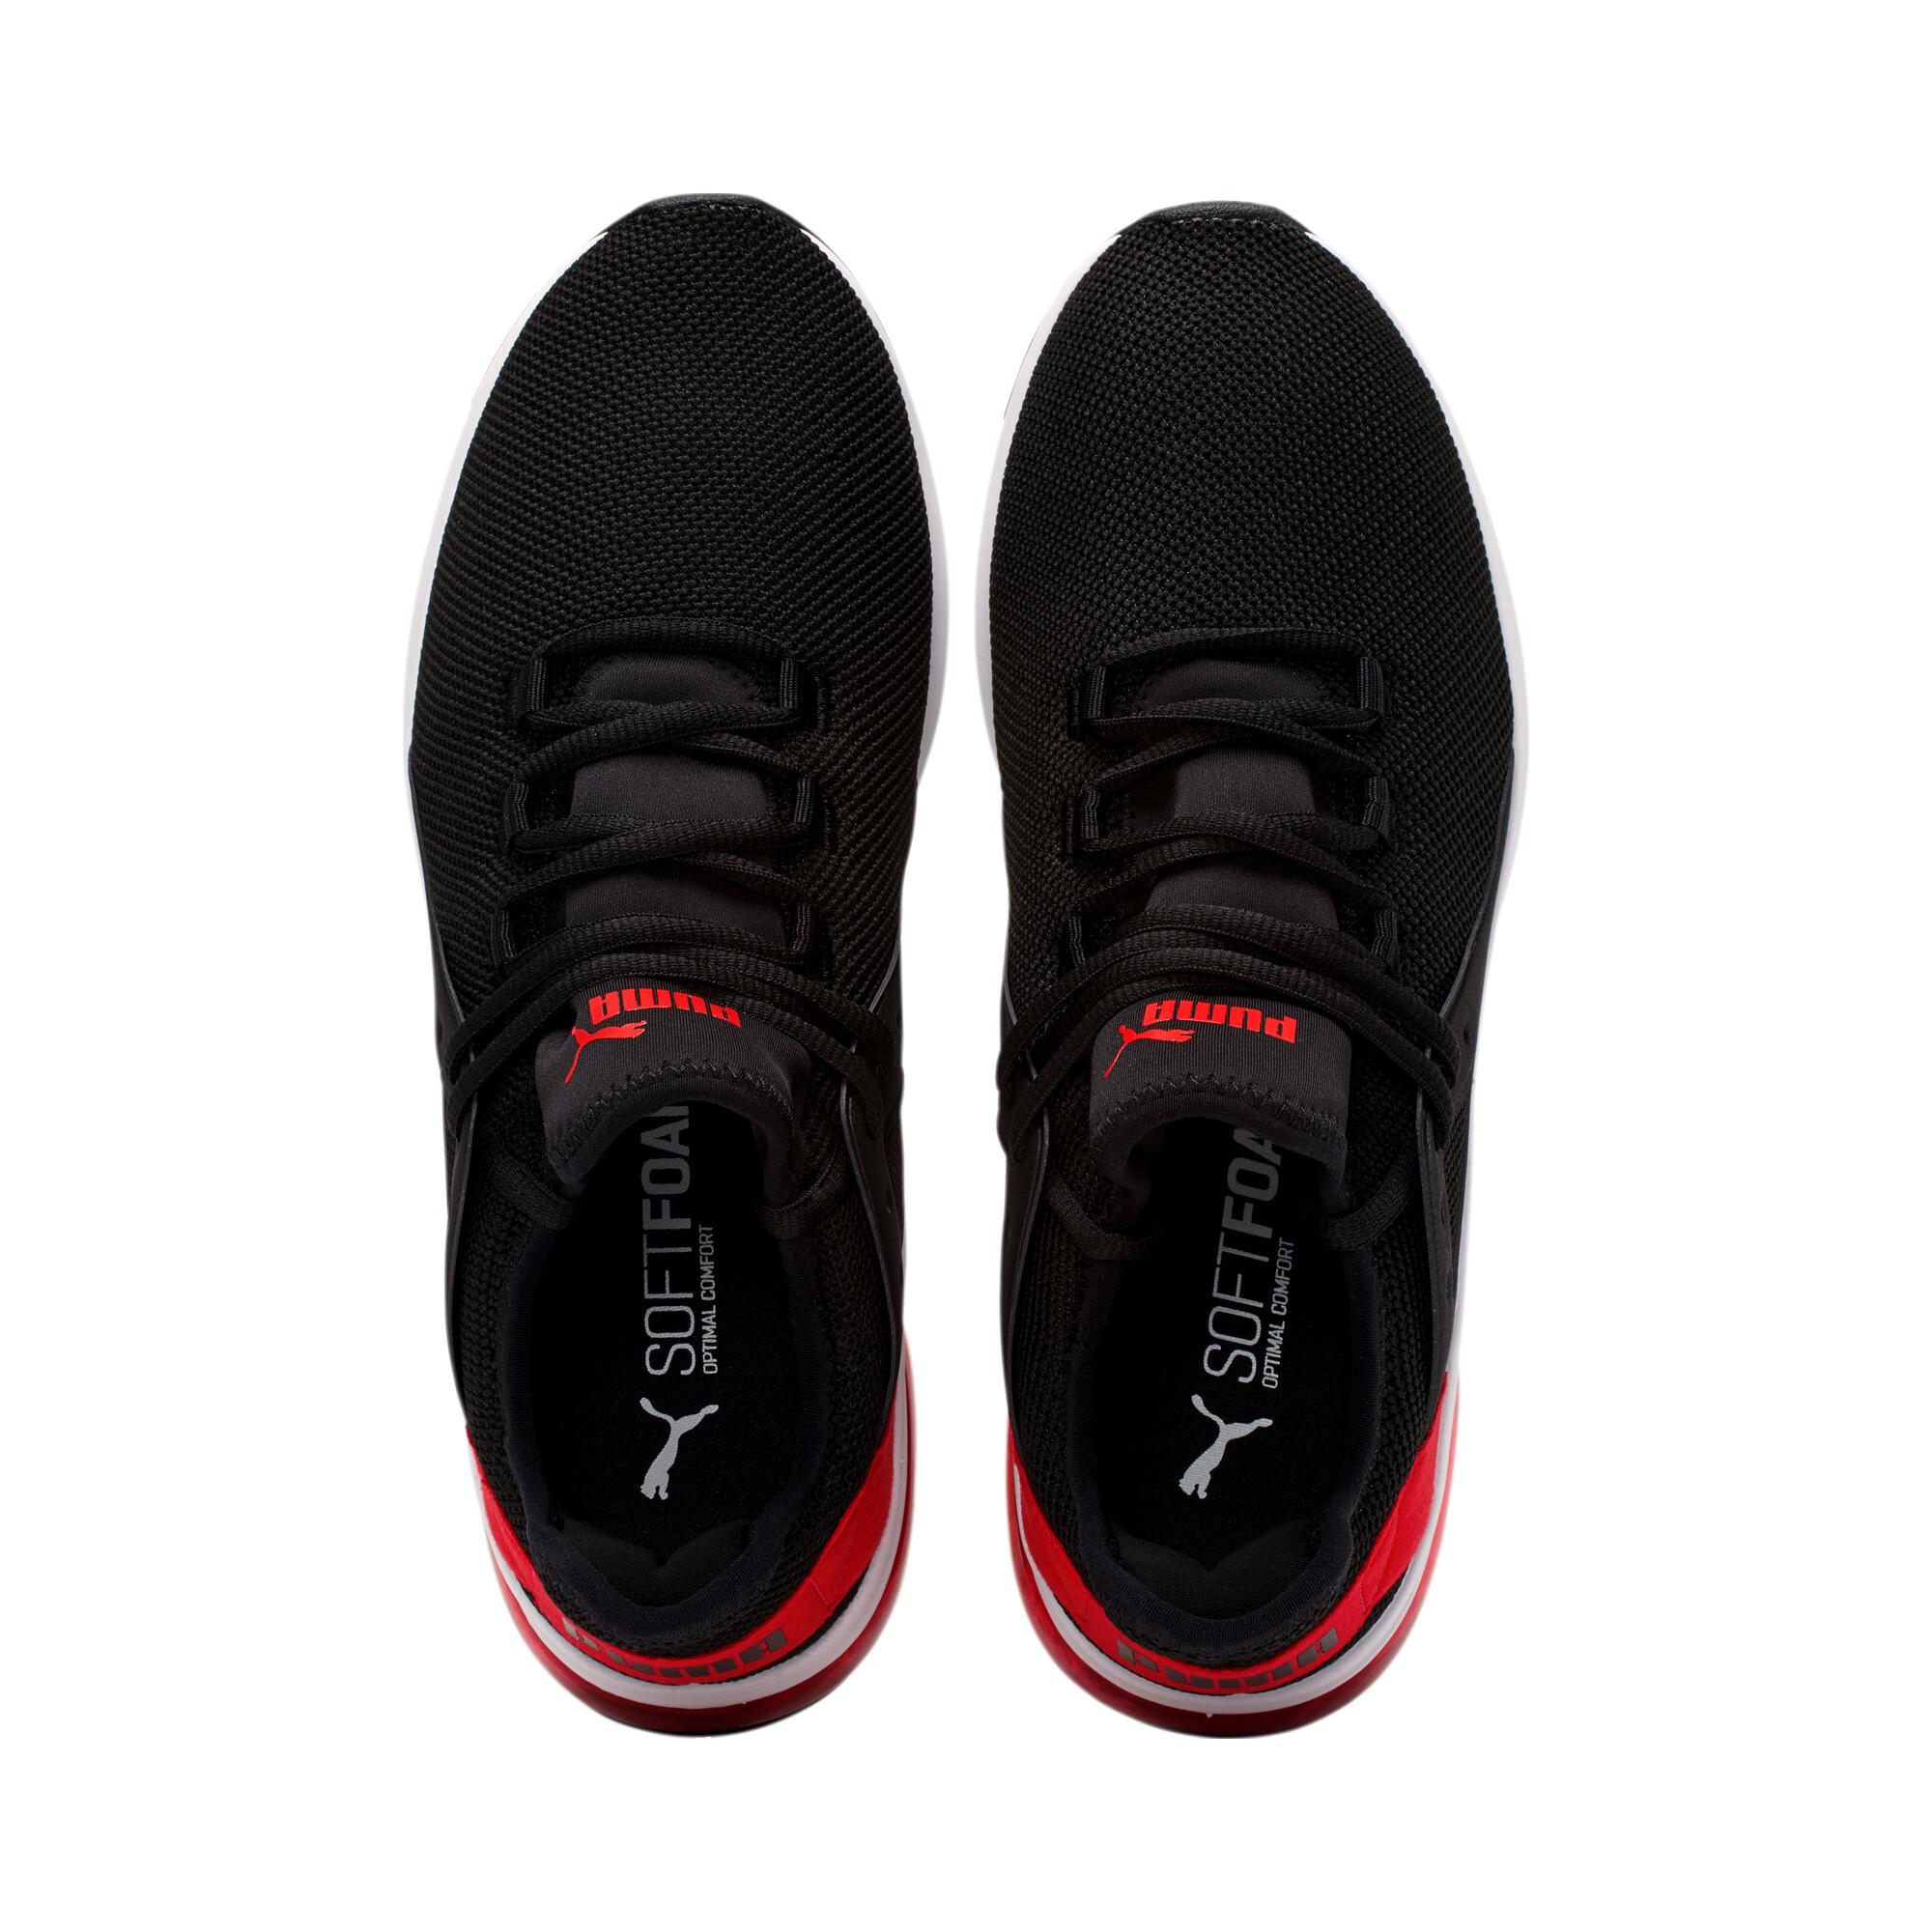 thumbnail 35 - PUMA Men's Electron Street Sneakers